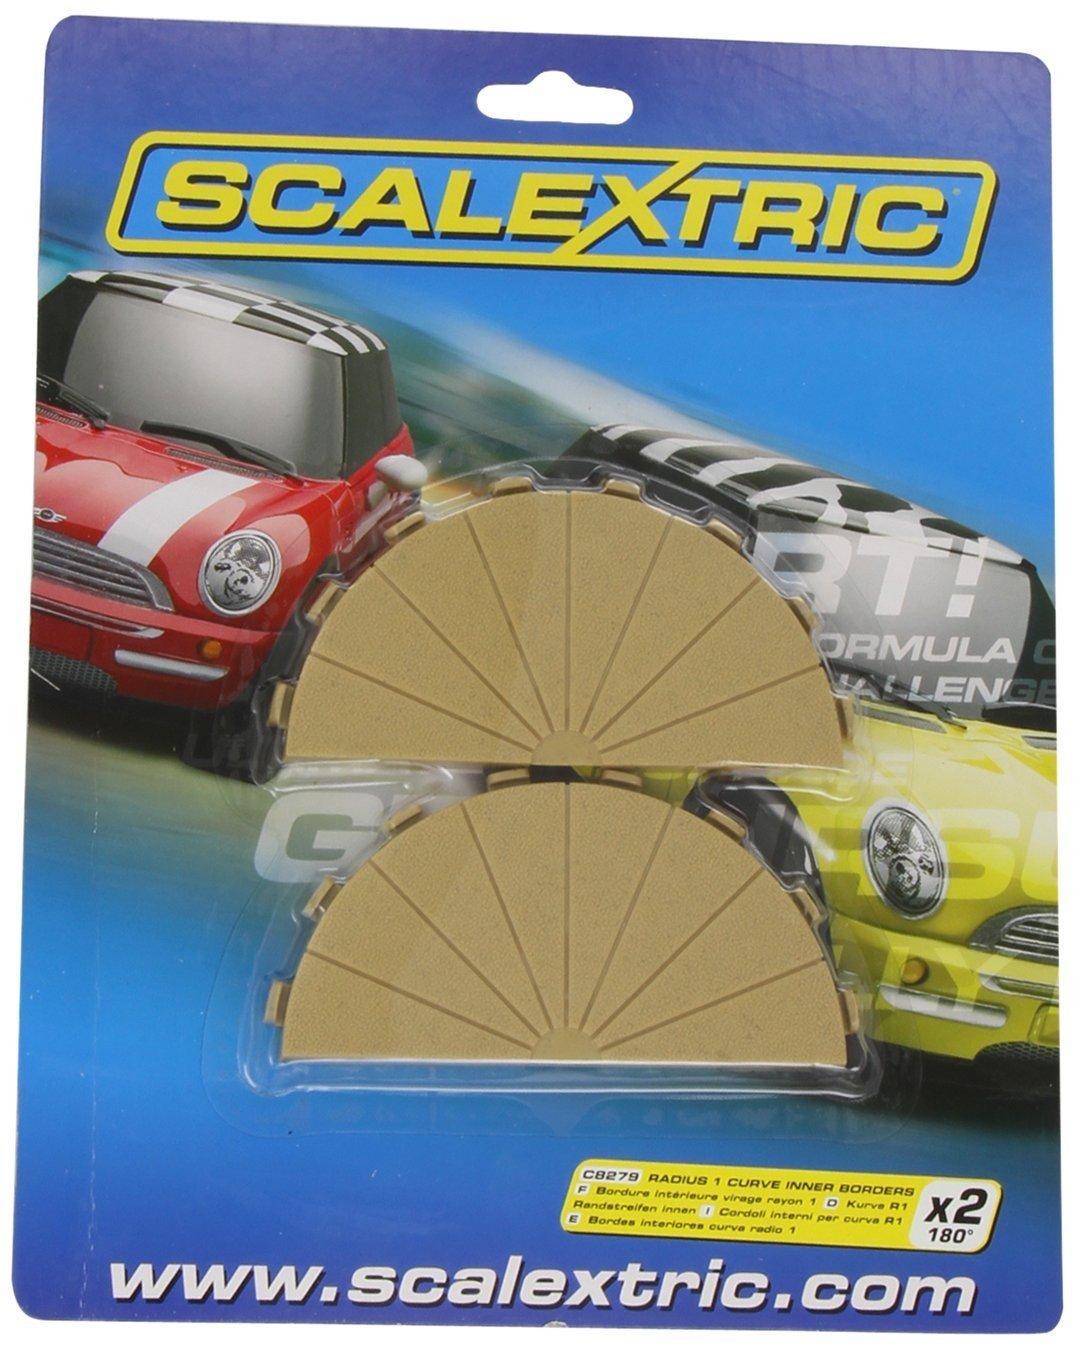 Scalextric C8279 Bordures Int/érieures Courbe Radius 1 180/° x2